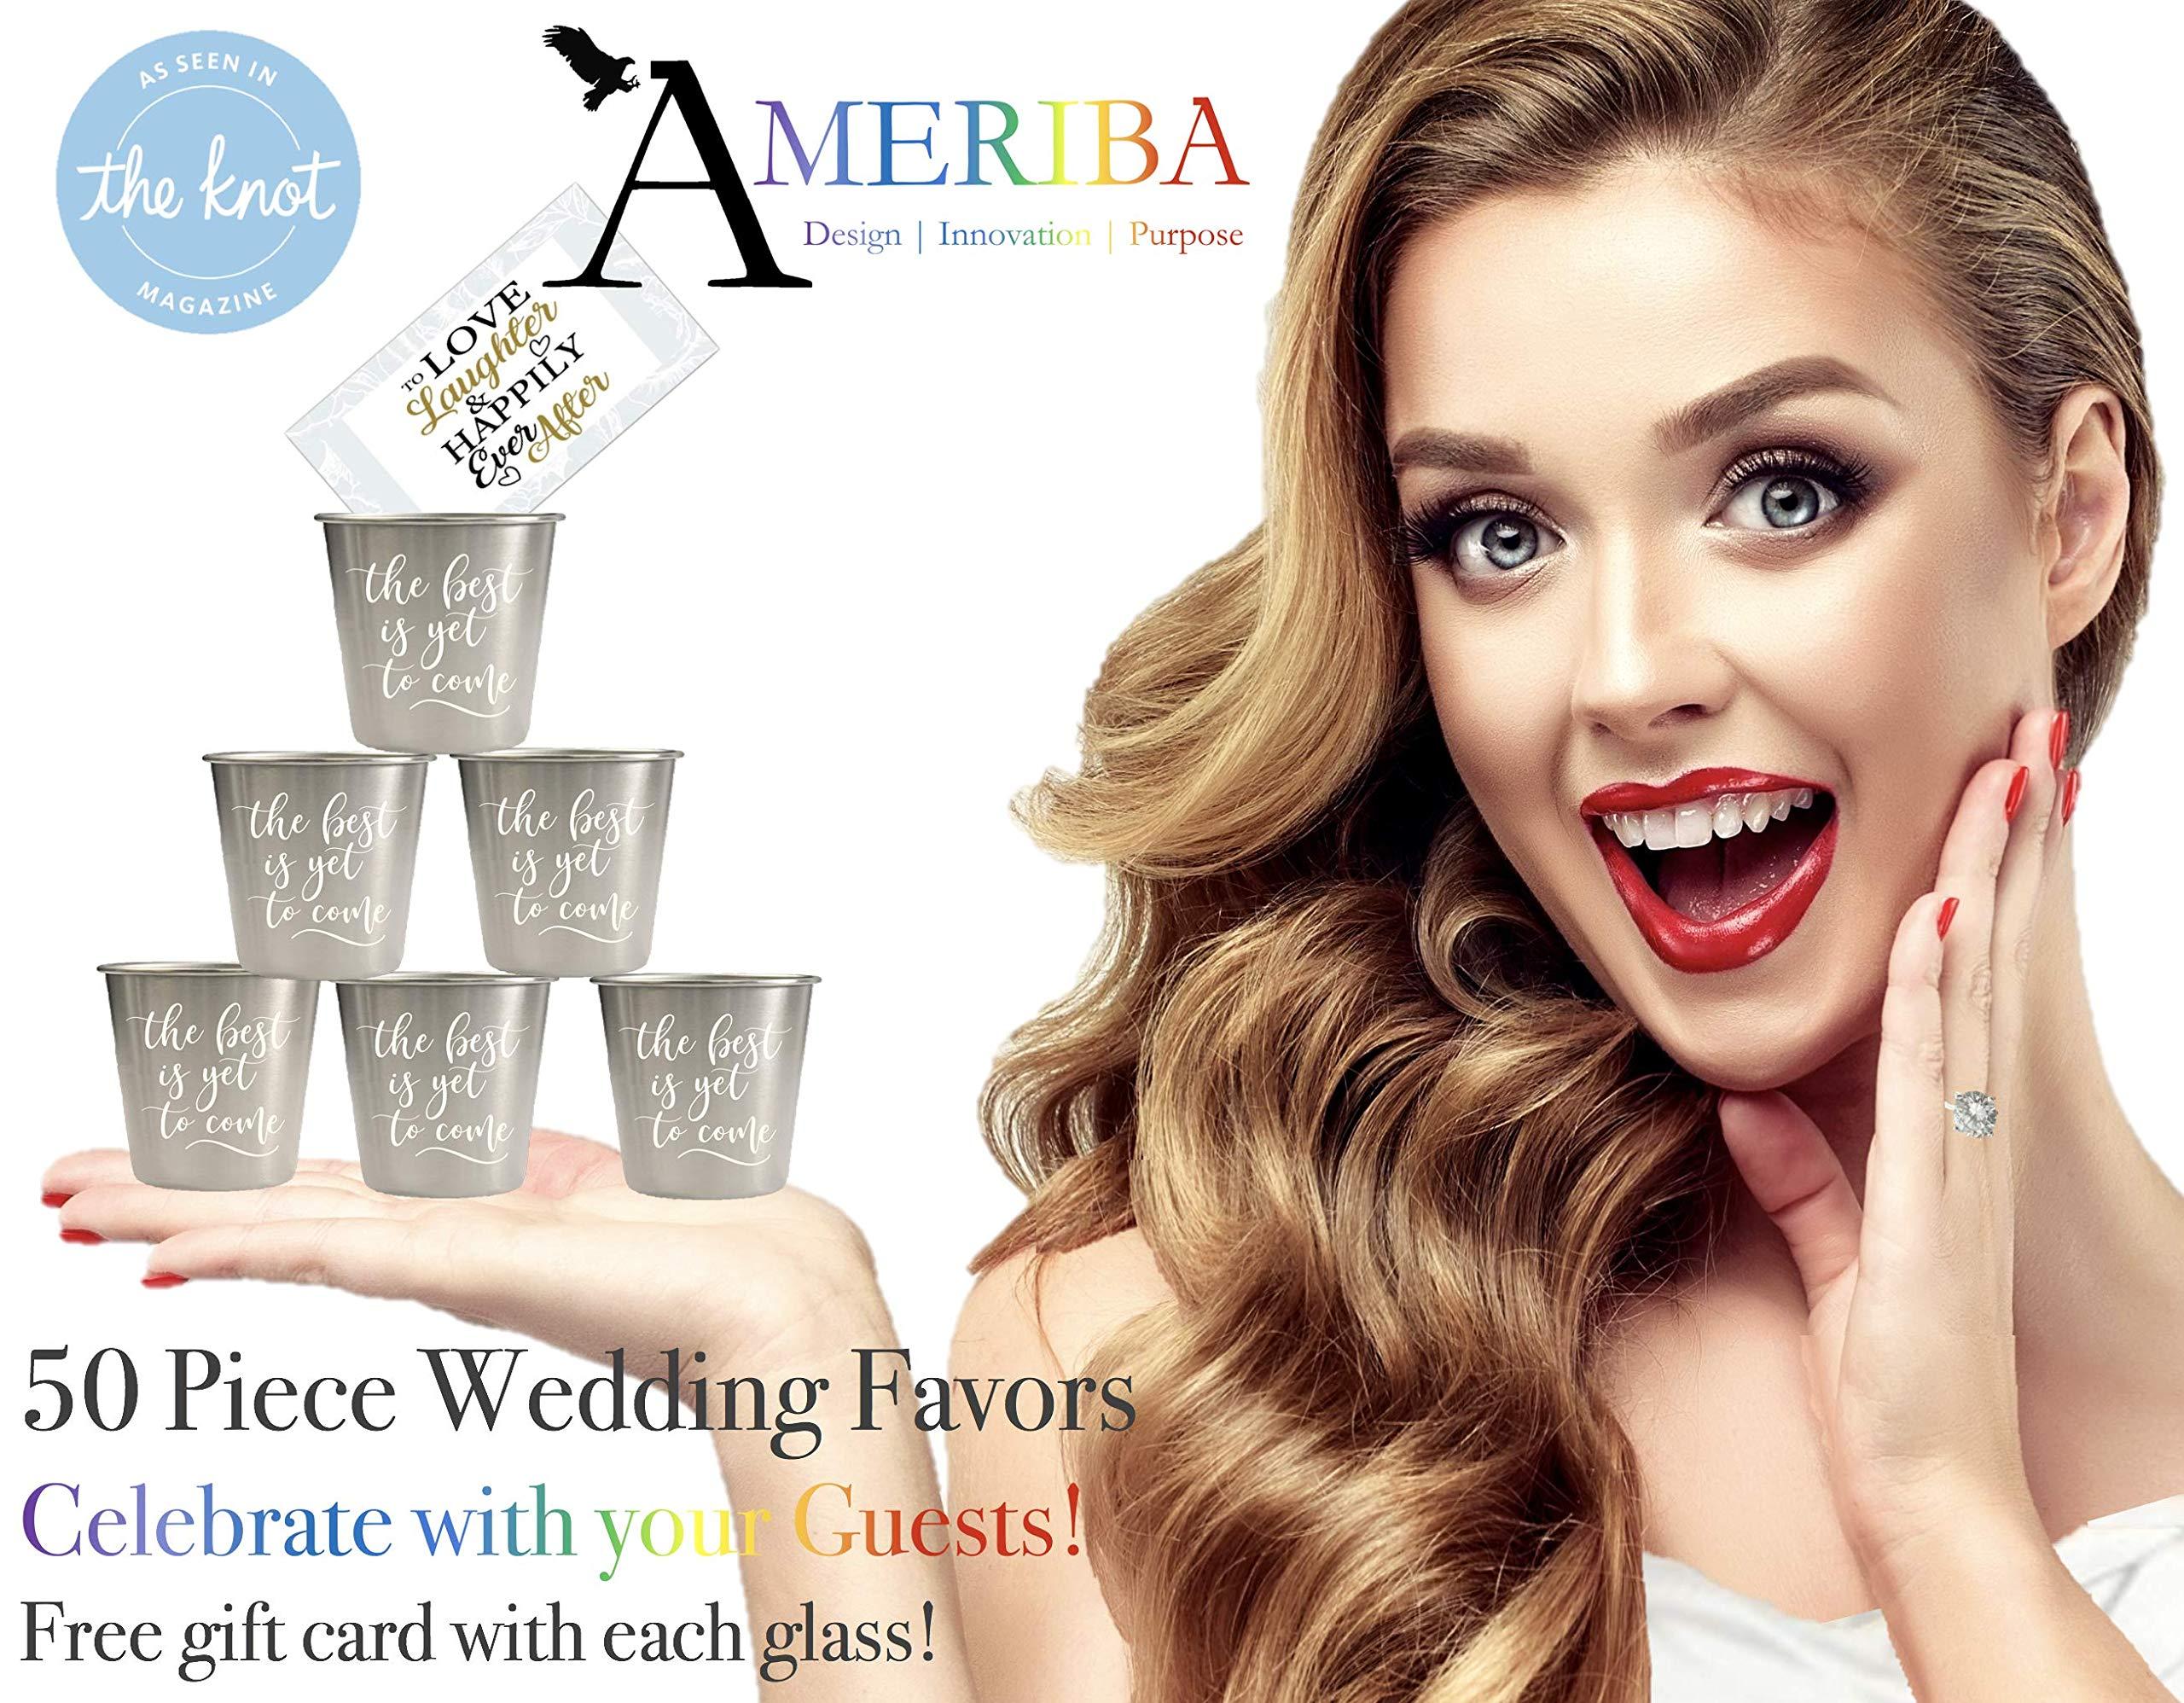 Wedding Favors | Premium Stainless Steel 1.5oz Shot Glasses | Groomsmen Shot Glasses, Bridesmaid Gifts for (Metallic Silver, 50)